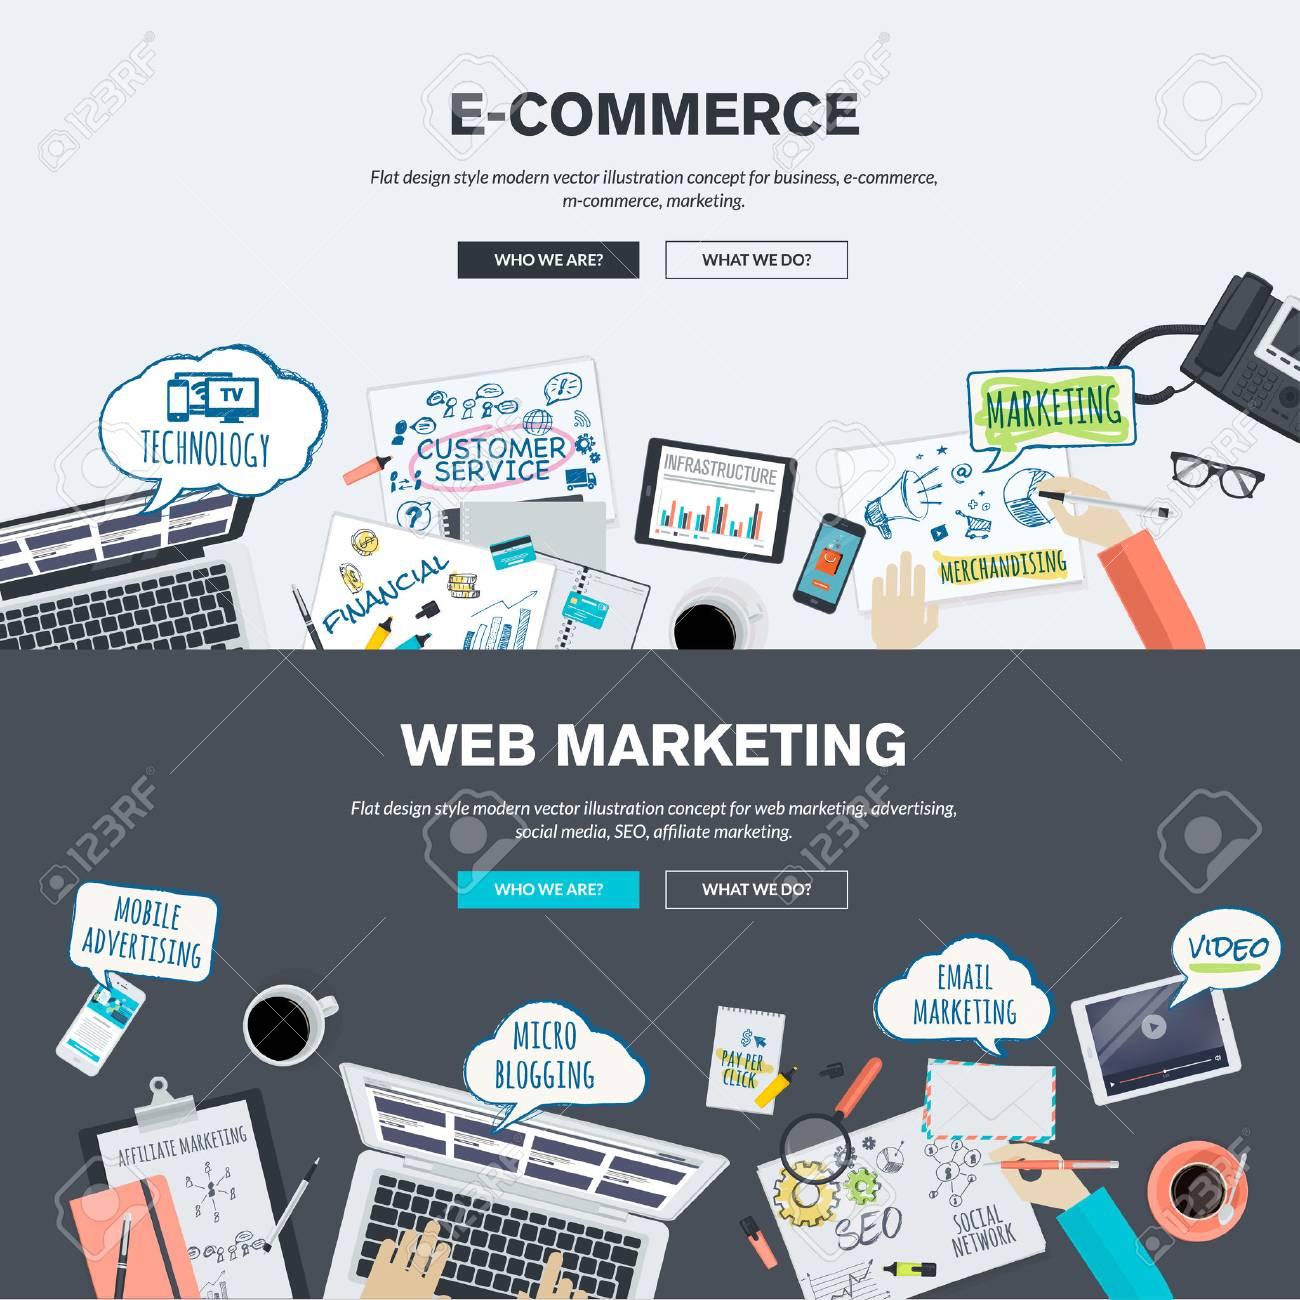 Banner design for e commerce - Set Of Flat Design Illustration Concepts For E Commerce And Web Marketing Concepts For